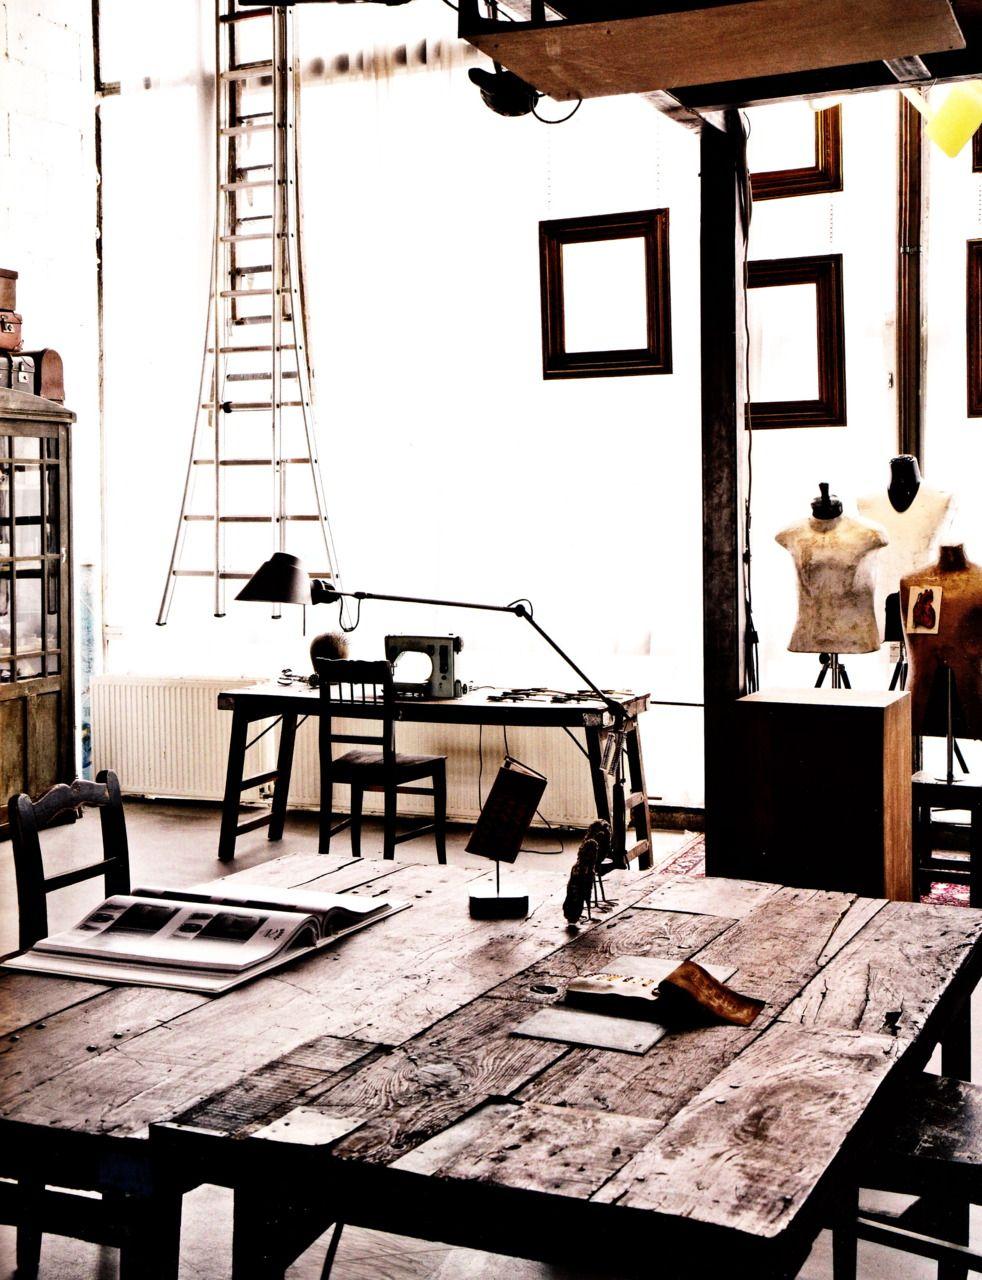 Sewing/dressmaking studio? Elle Decor Italia, March 2011.